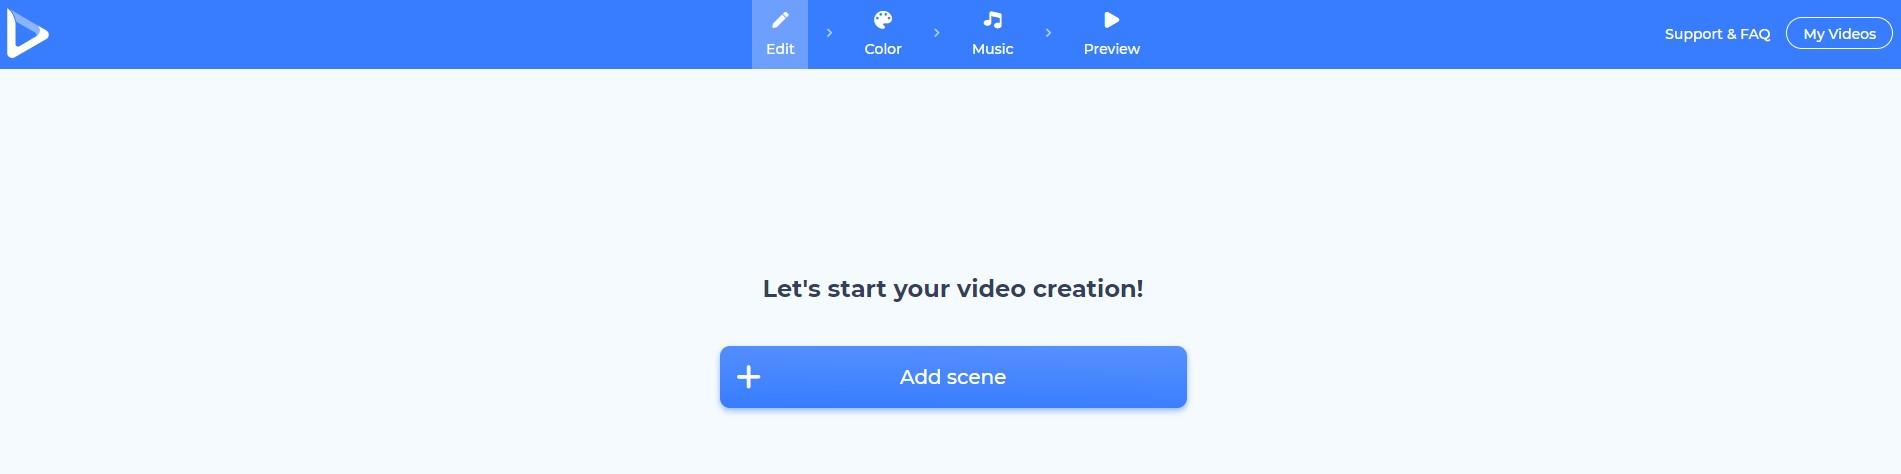 Video Presentation Editor